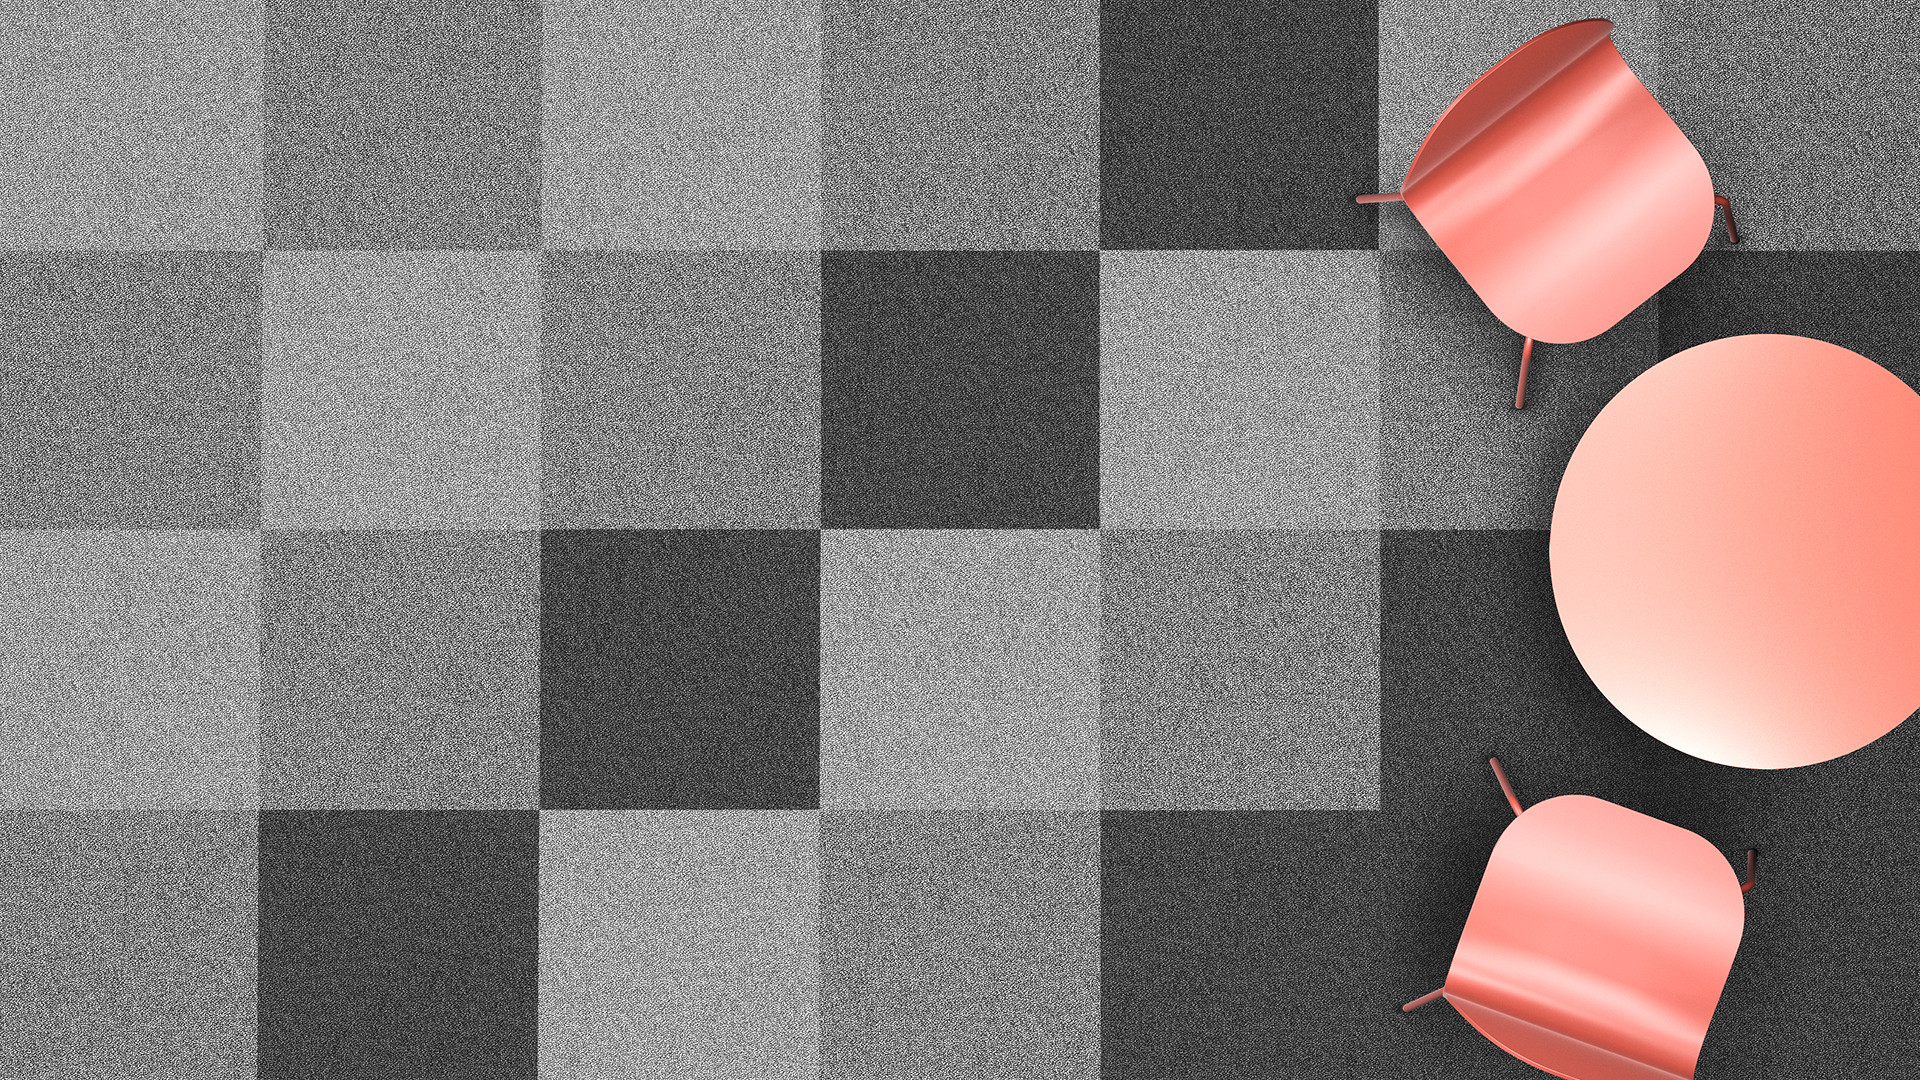 kavrolex_tile_carpet_00009_2.jpg